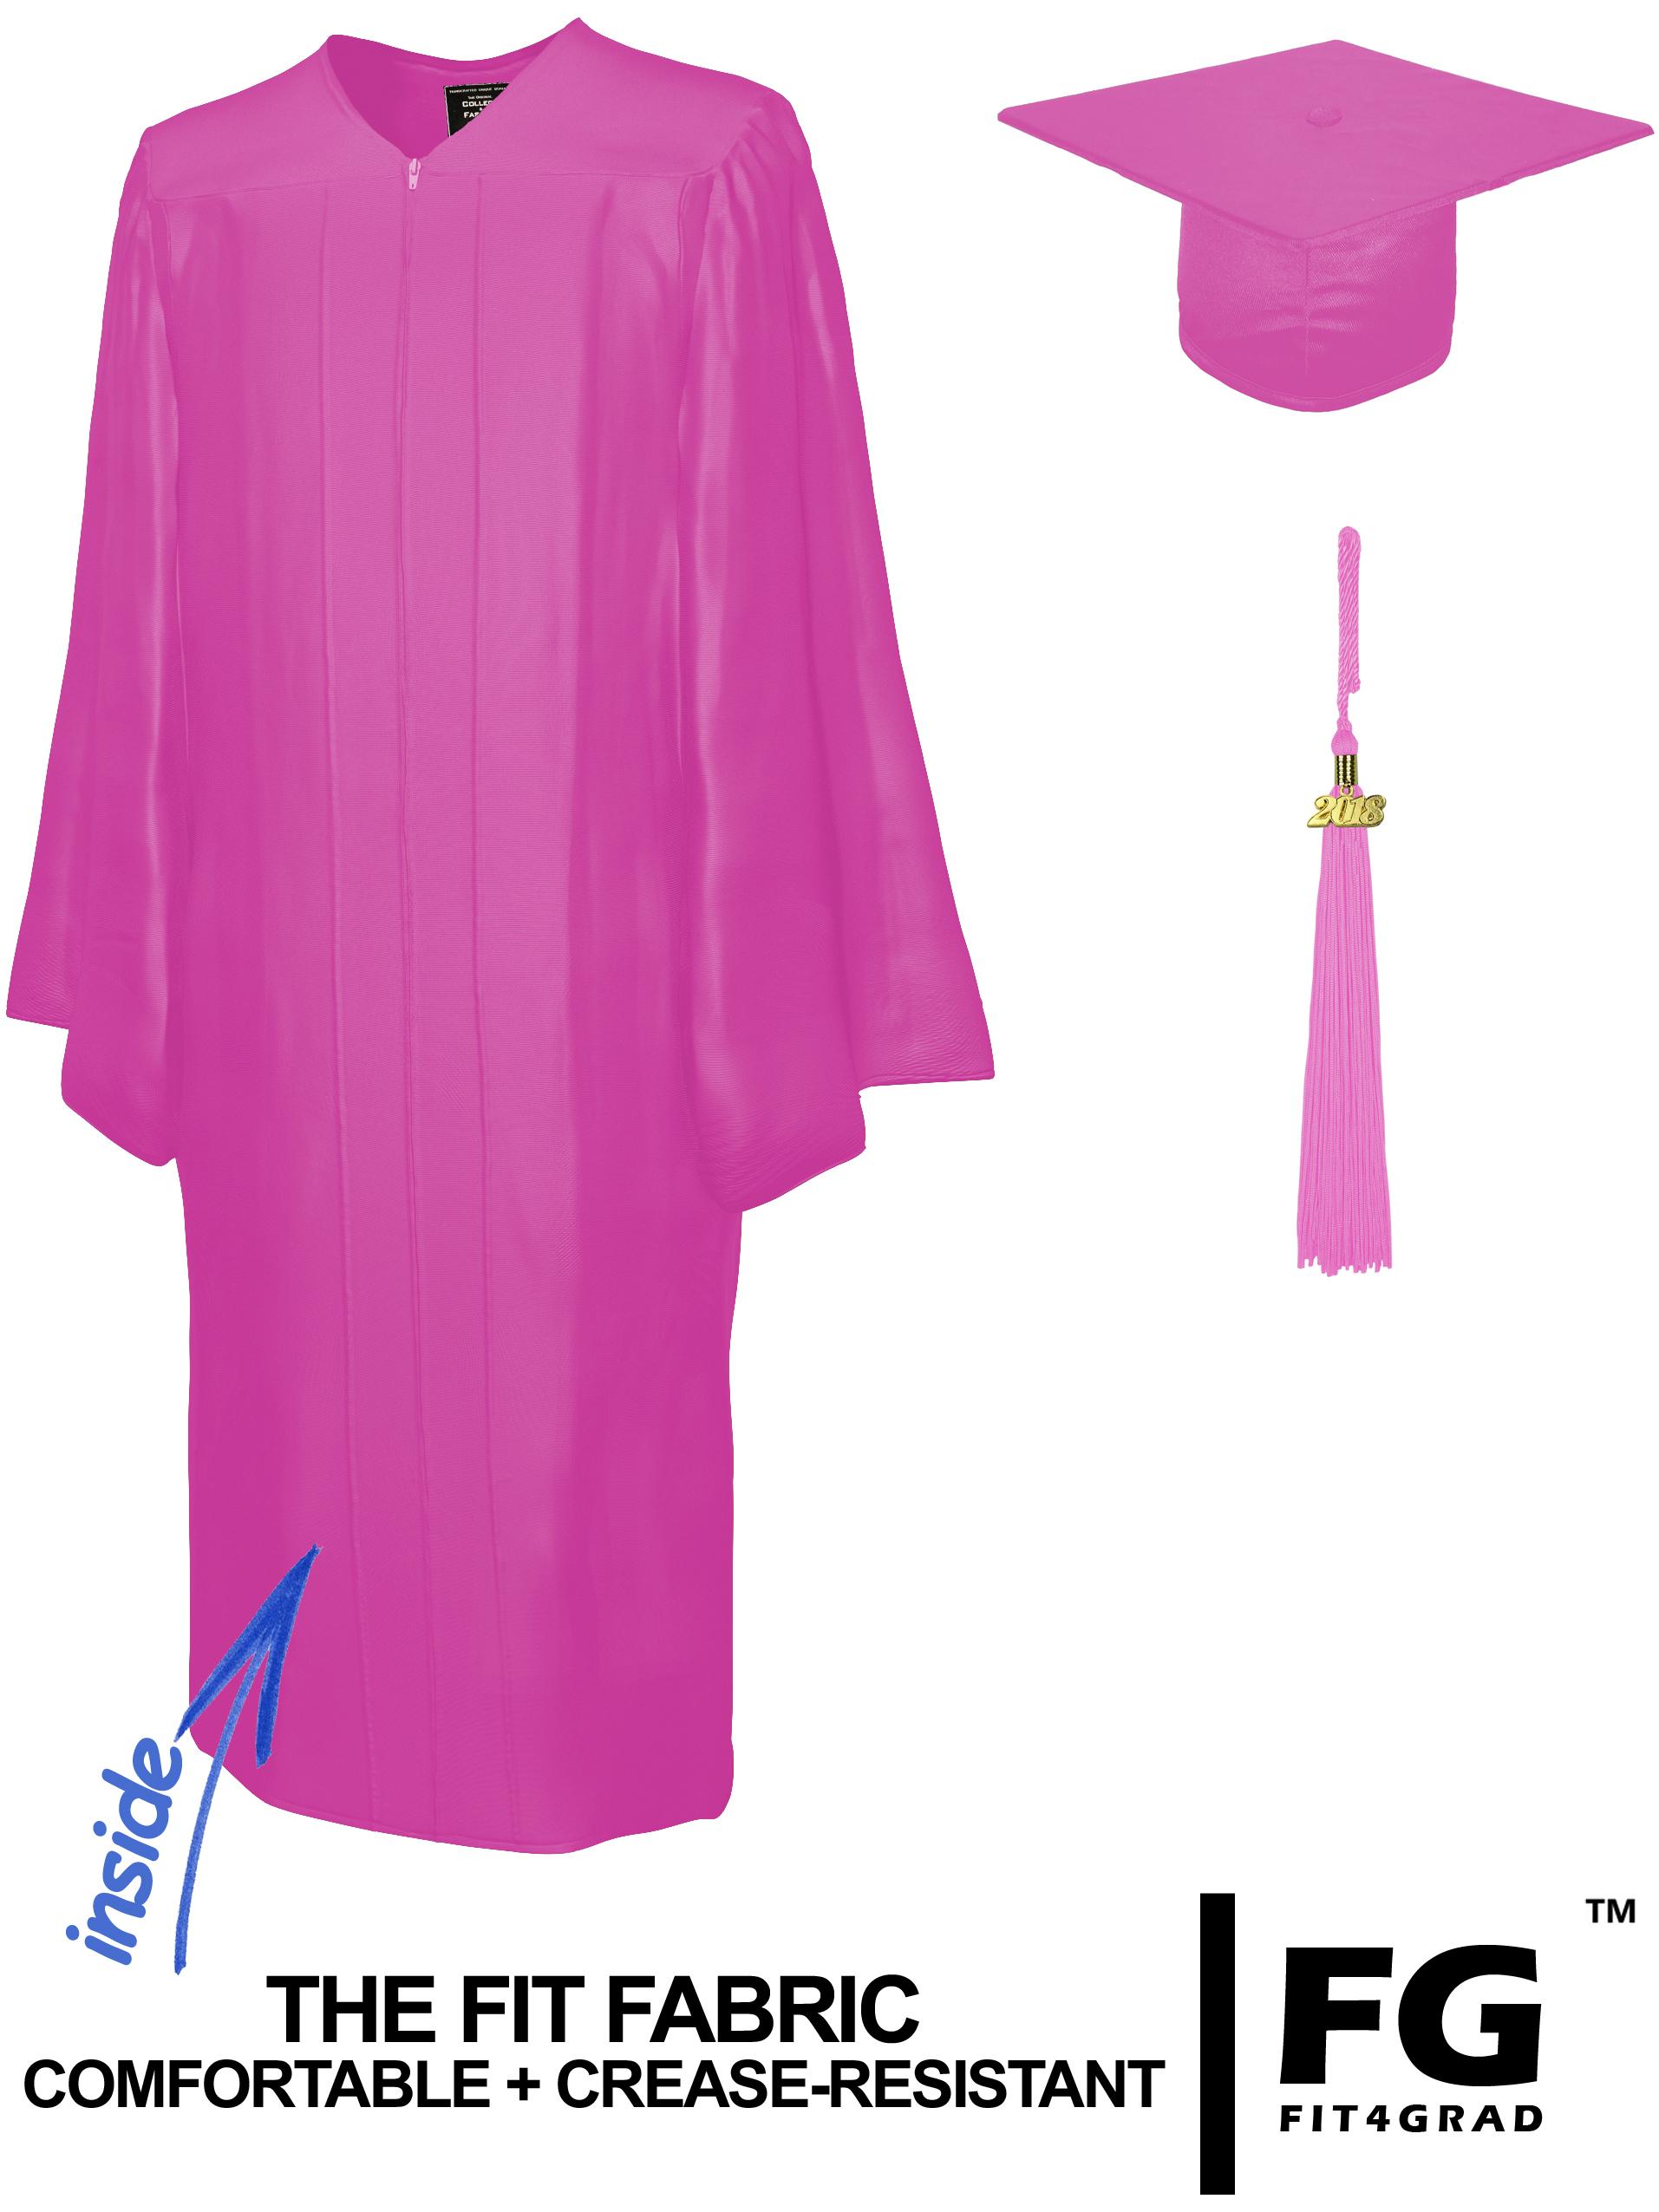 Shiny Bachelor Academic Cap, Gown & Tassel pink-cf103200